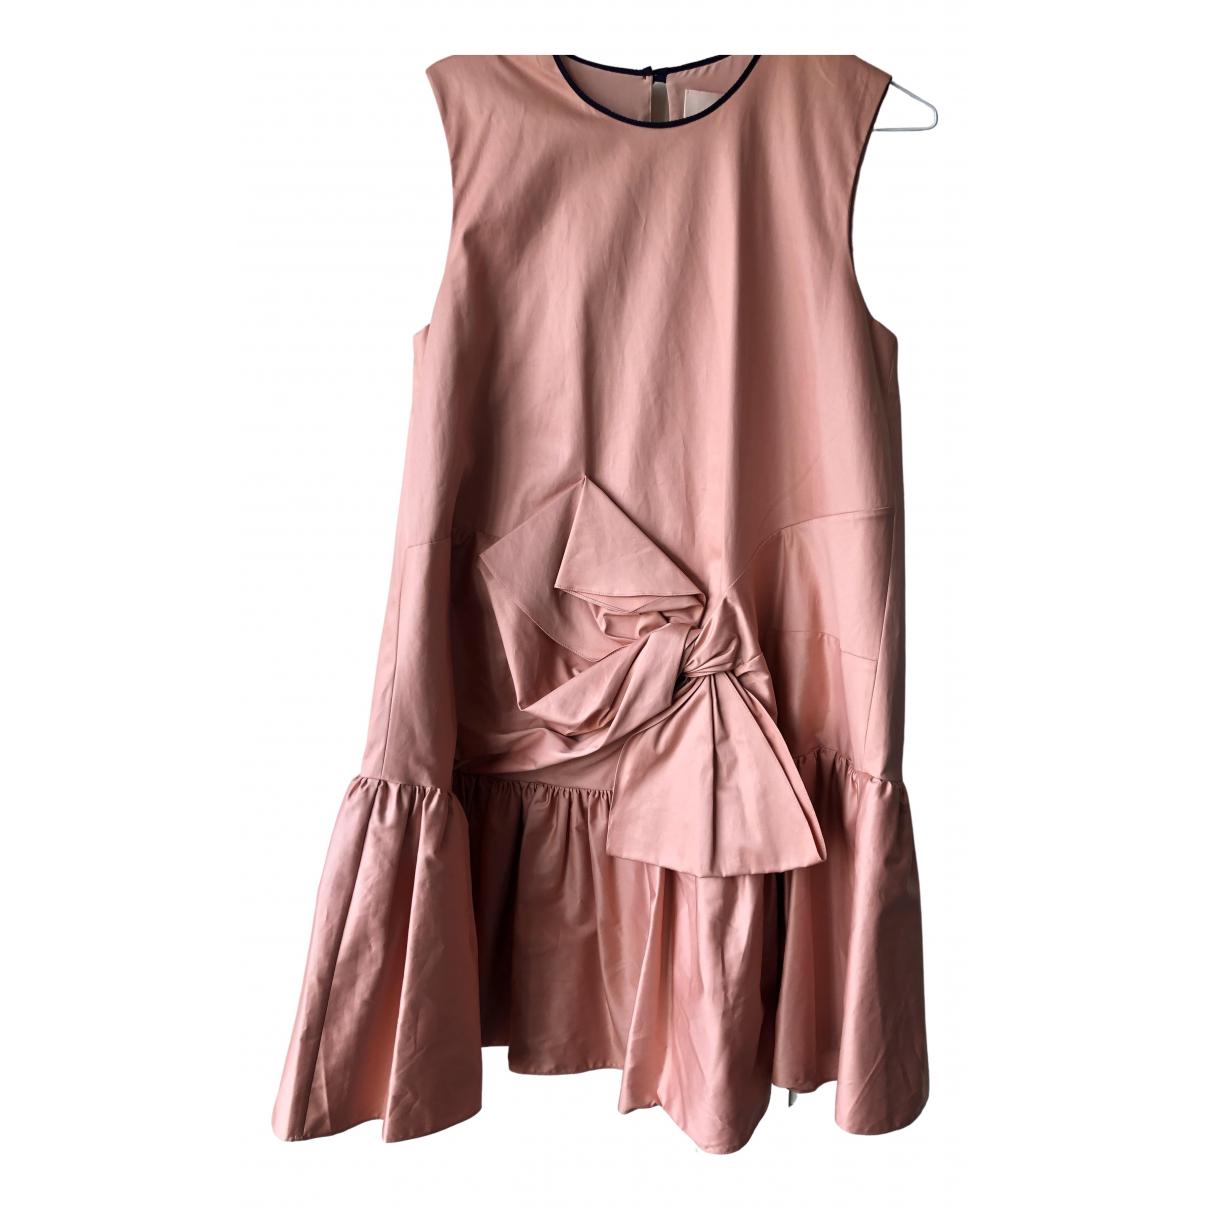 Roksanda N Beige Cotton dress for Women 10 UK